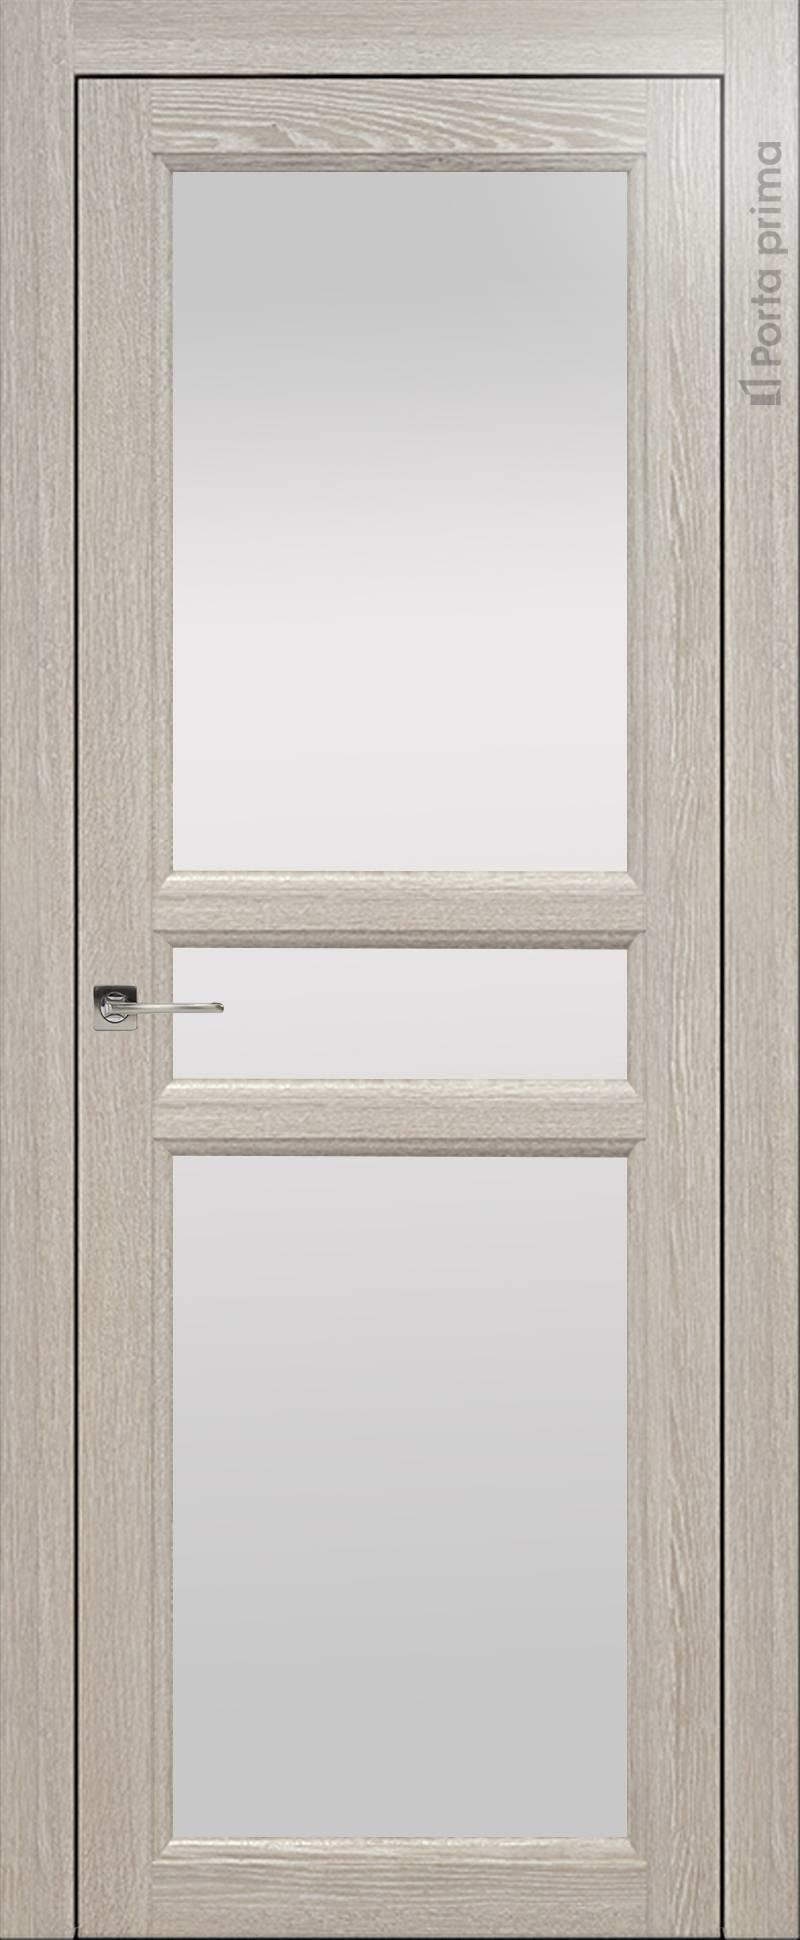 Sorrento-R Е2 цвет - Серый дуб Со стеклом (ДО)